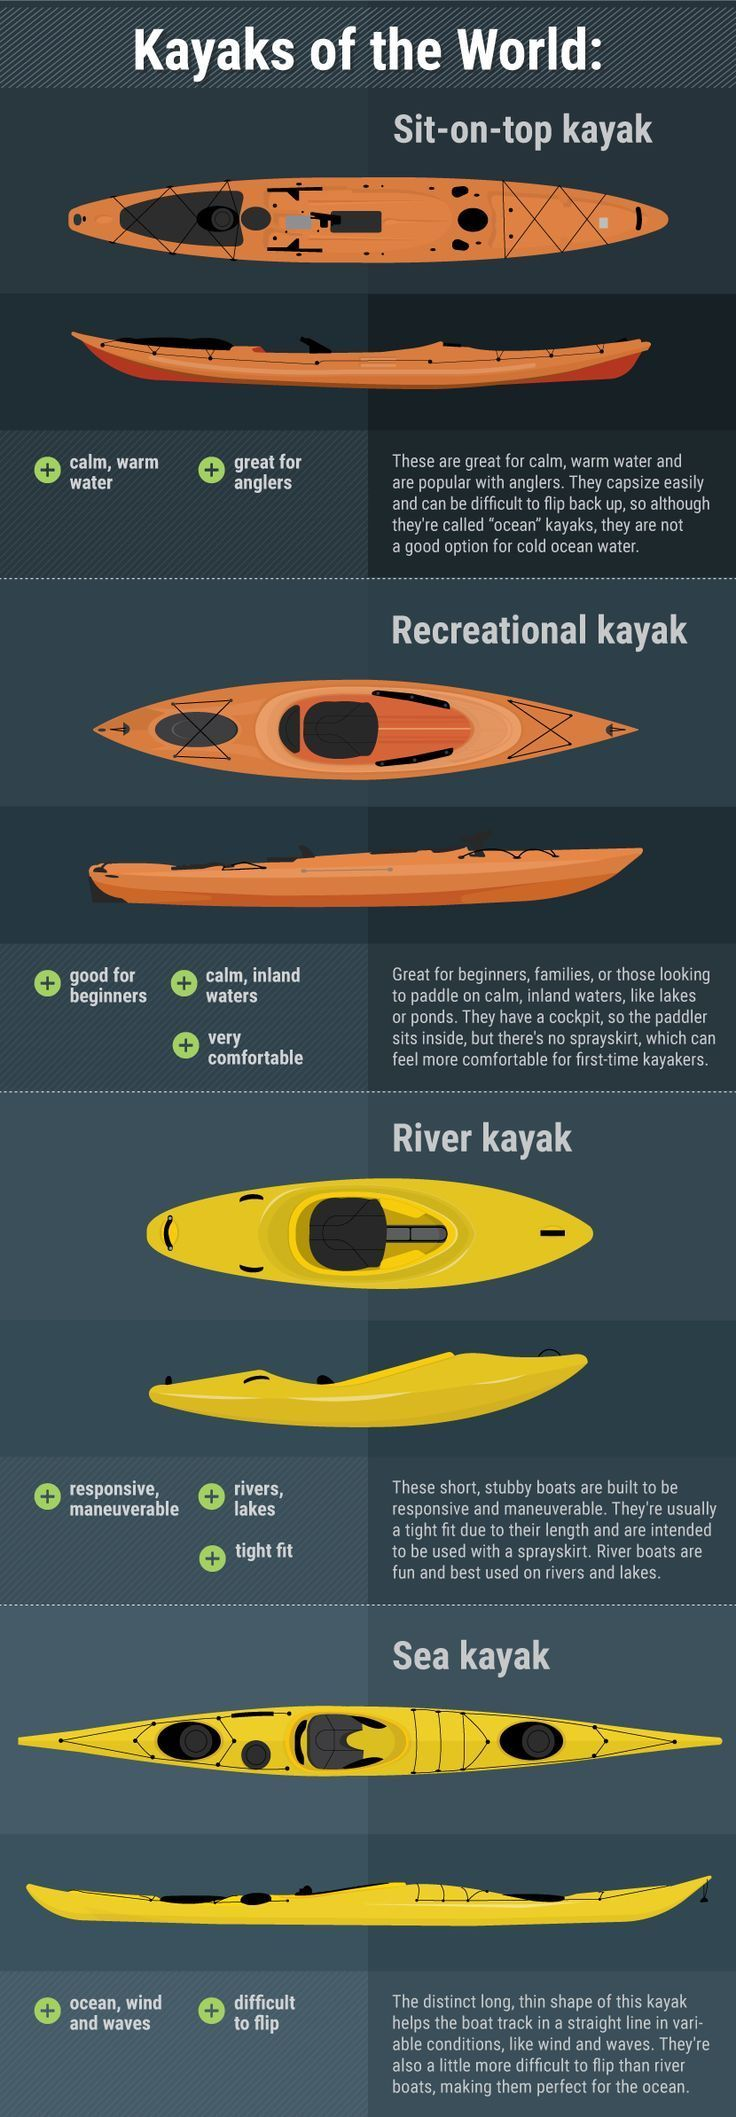 Kayaks of the World